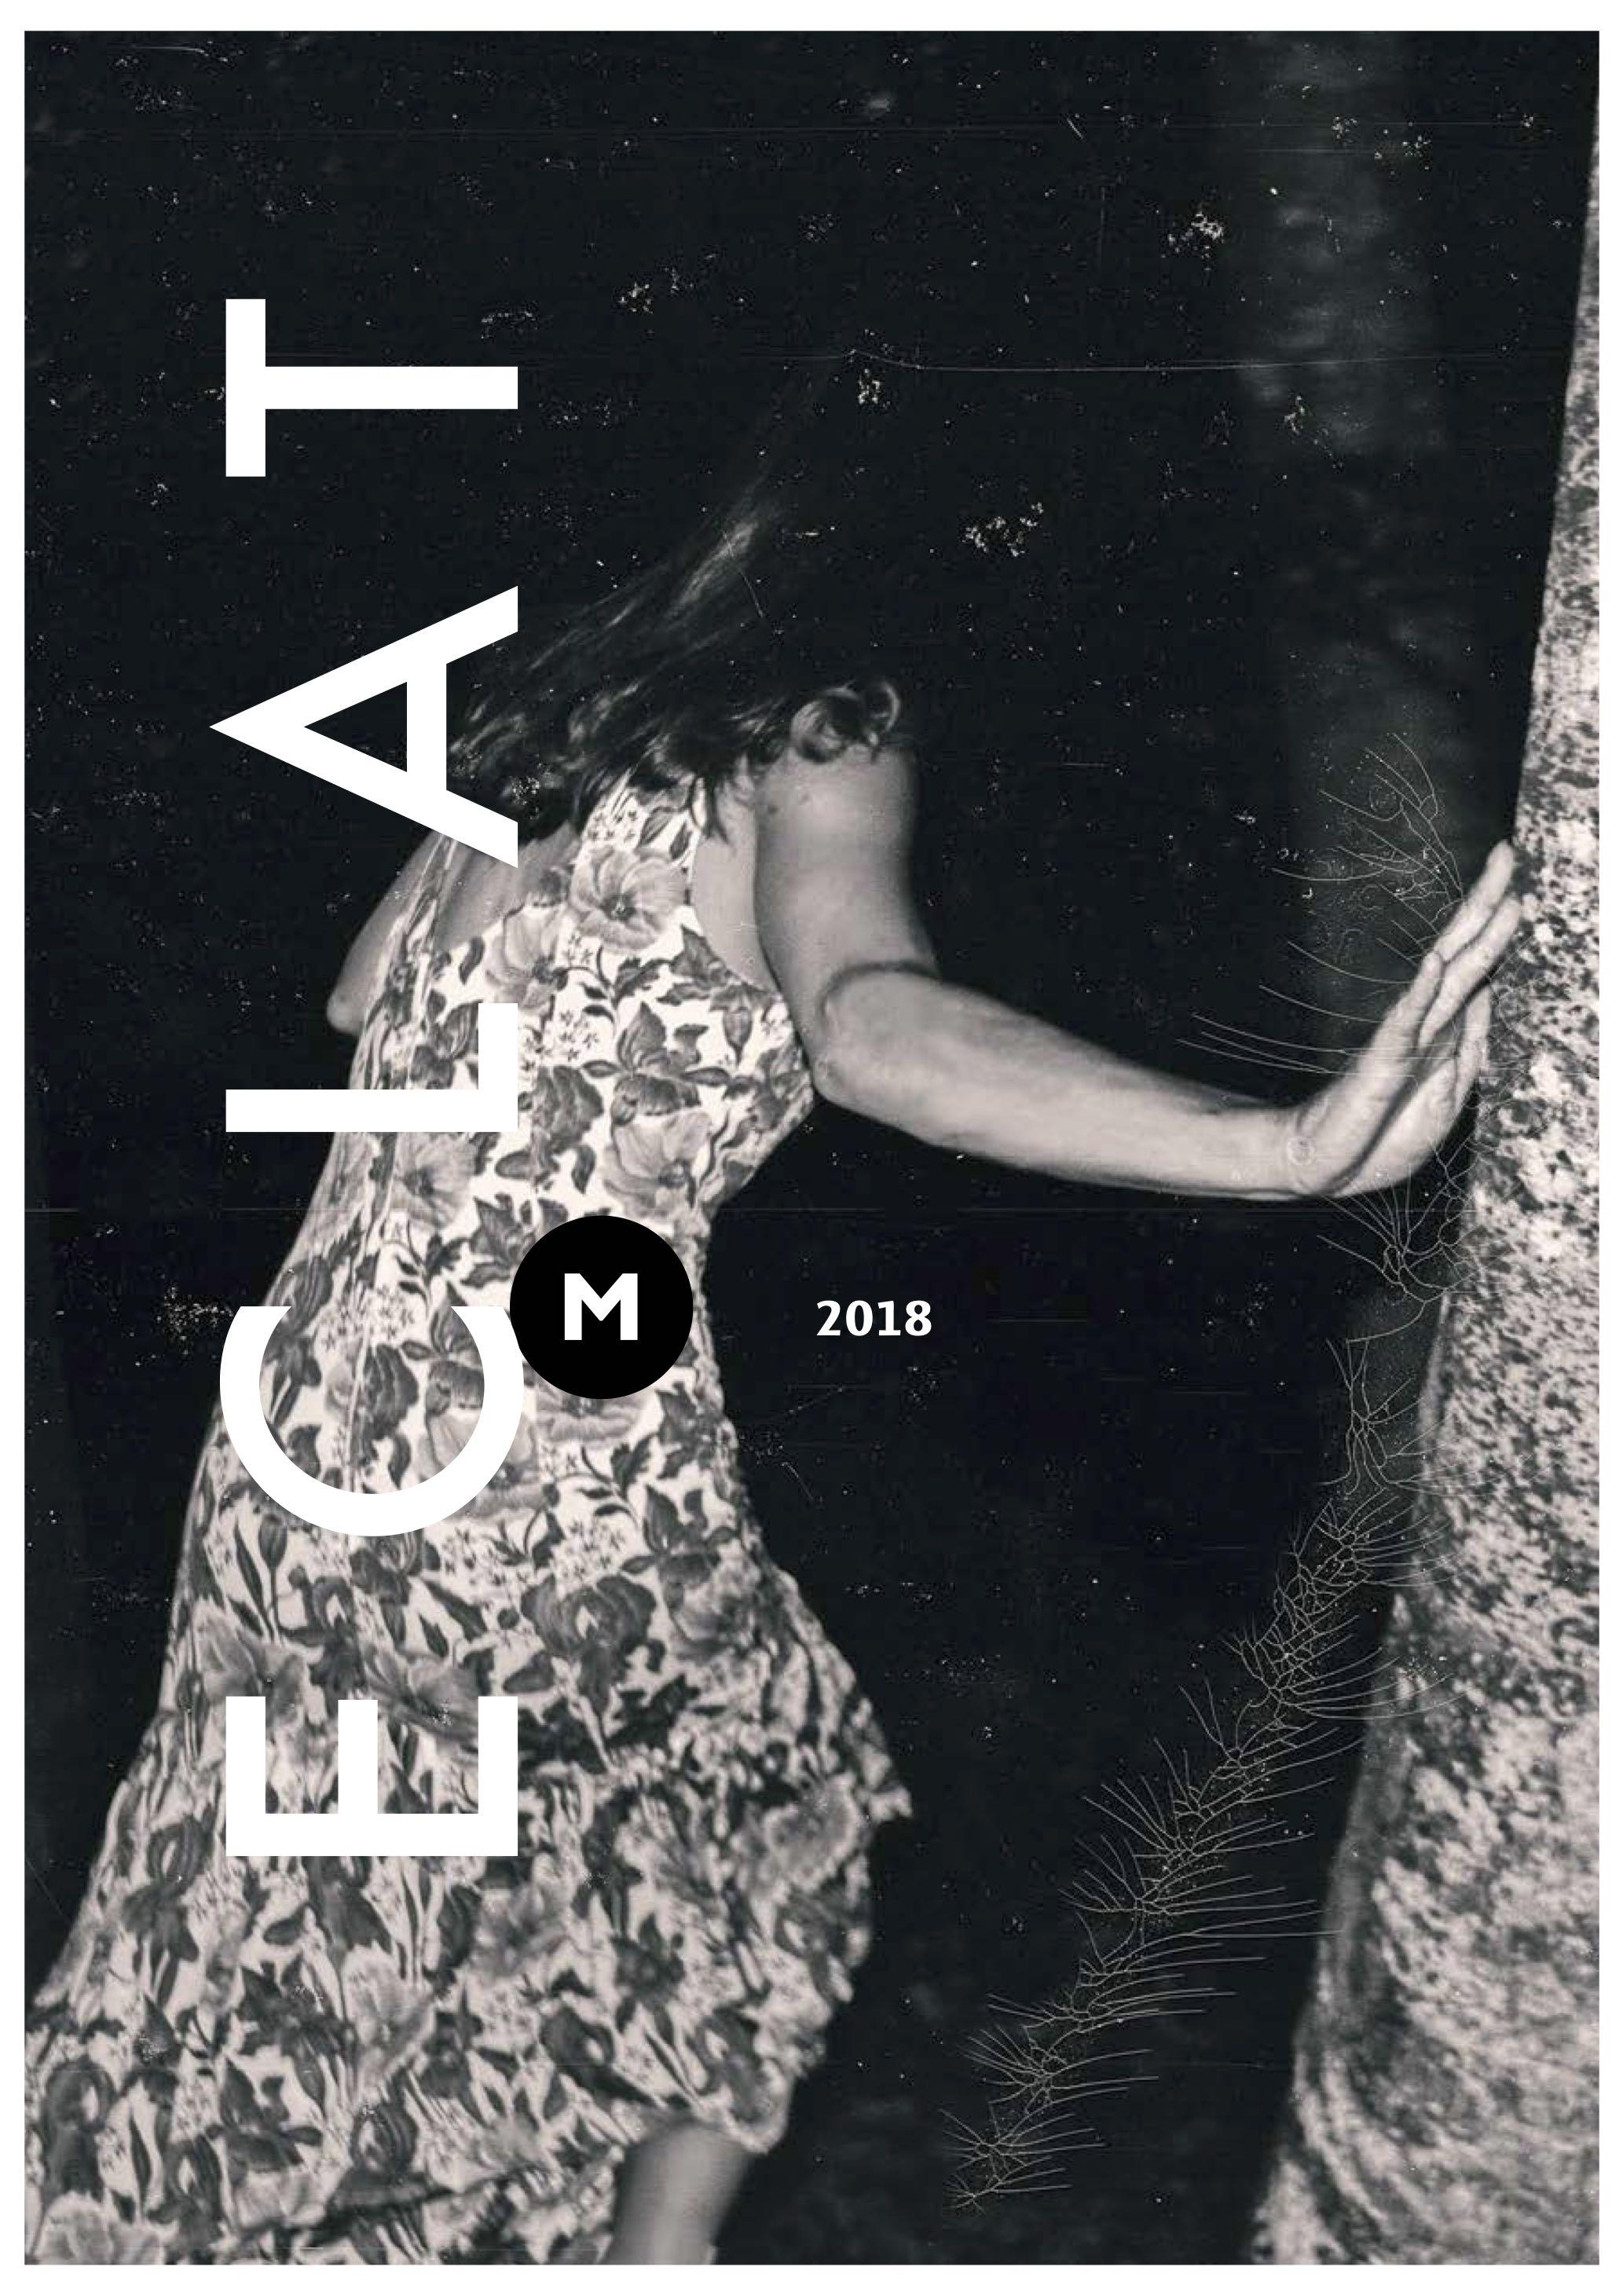 Eclat-Festival, Programmheftfoto